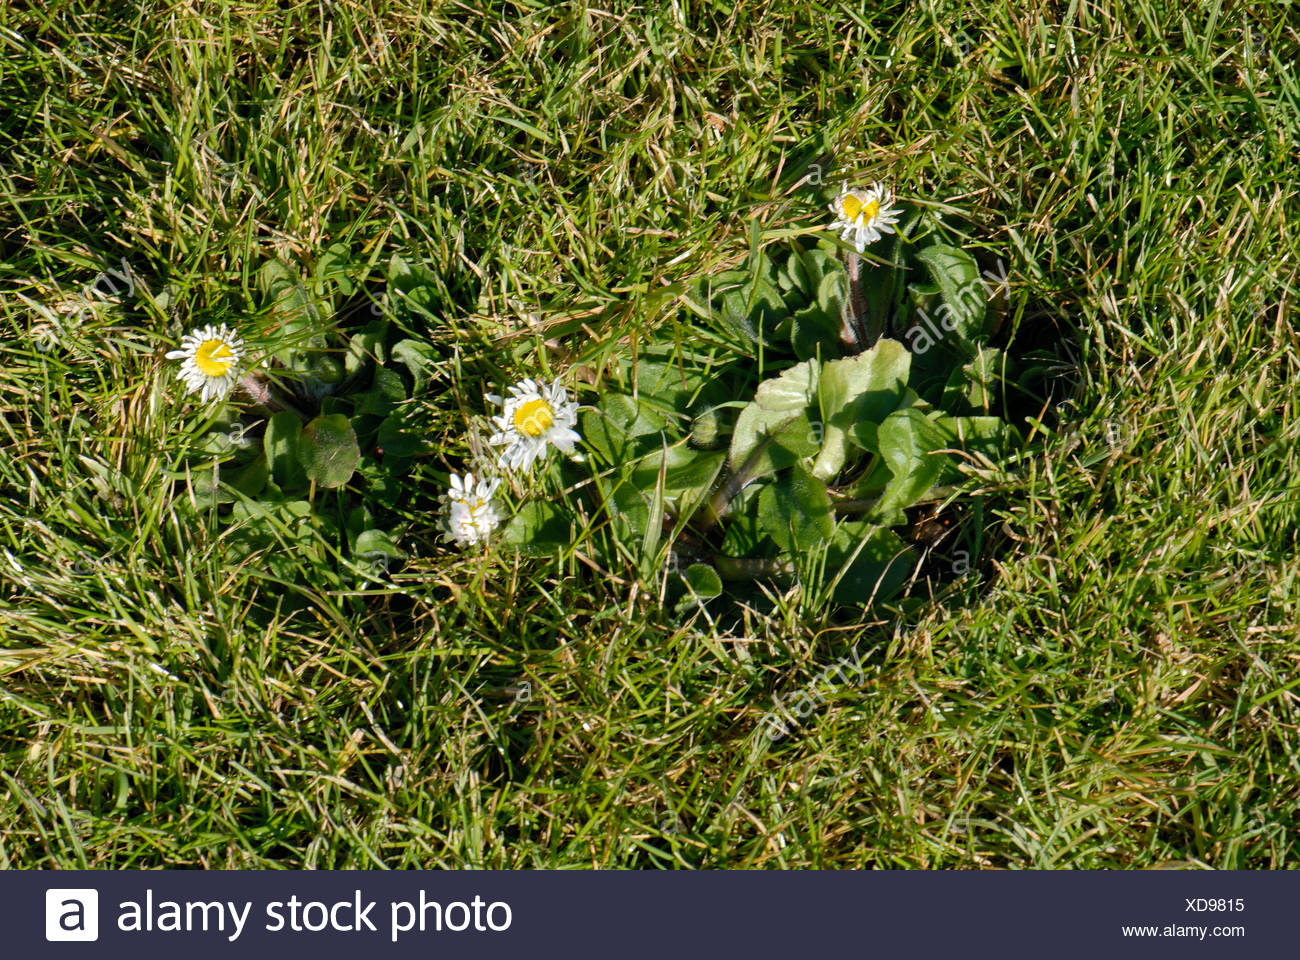 Flowering daisy Bellis perennis in a garden lawn Stock Photo